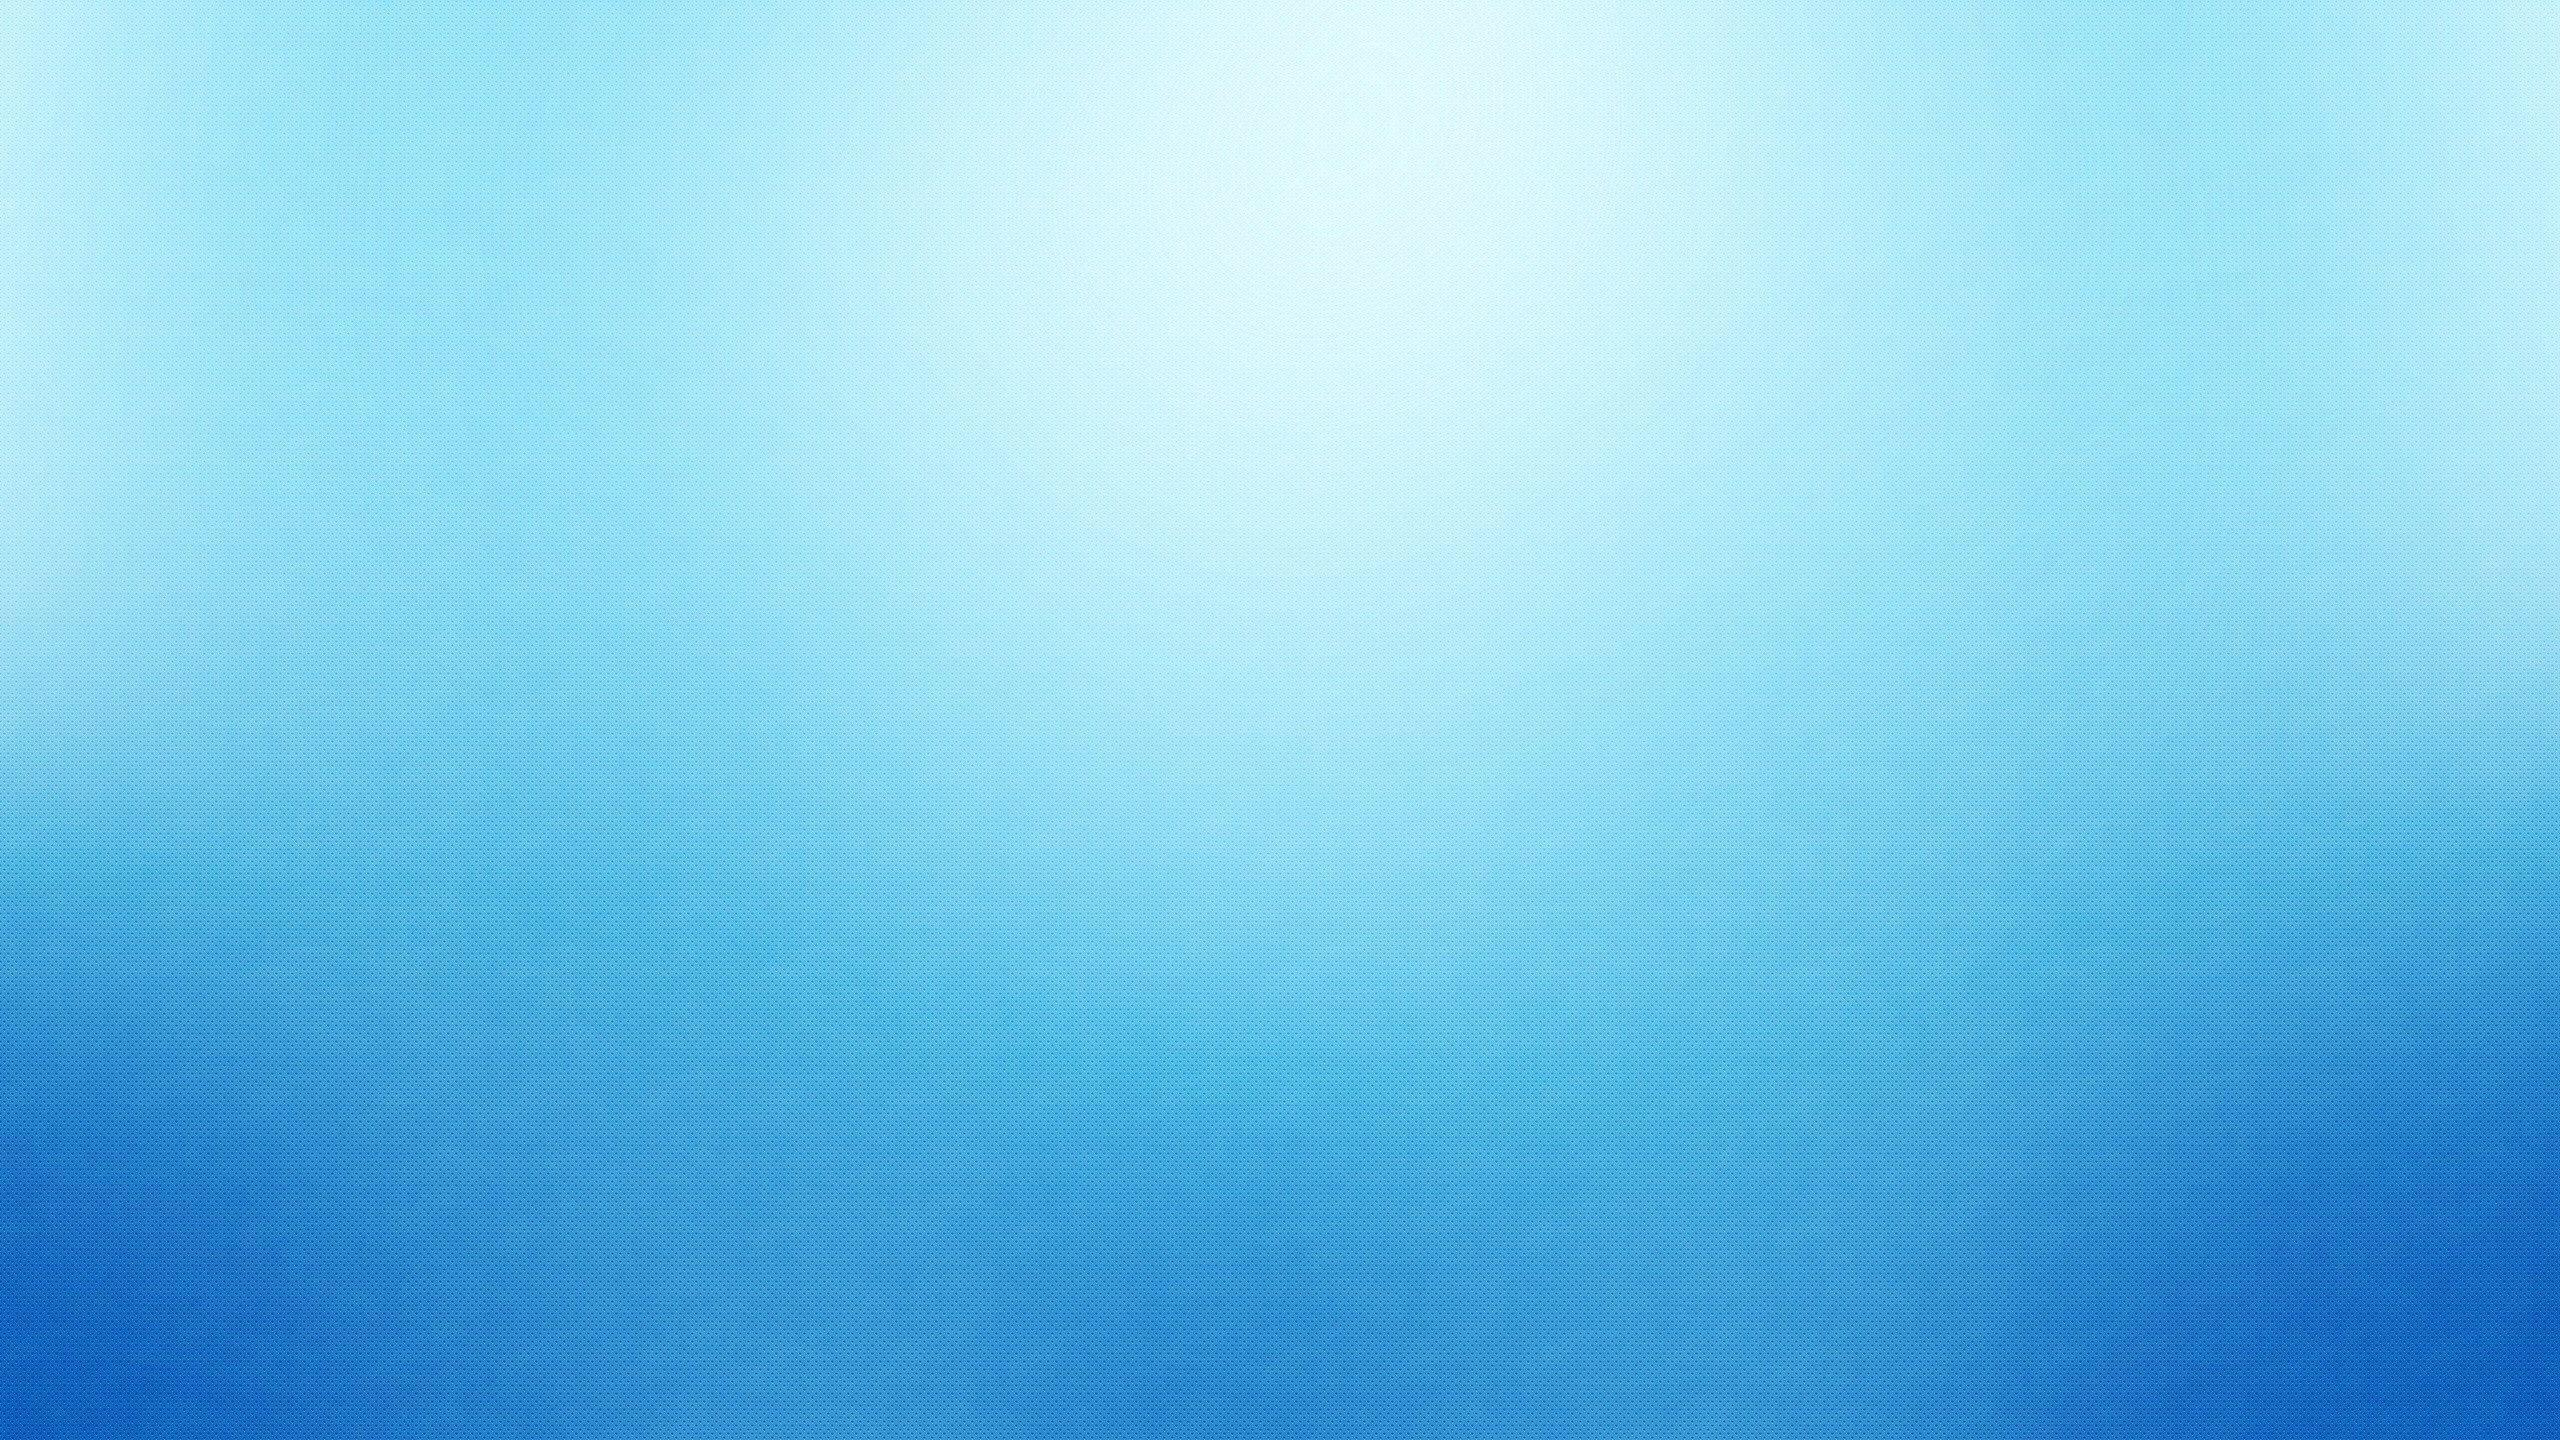 1920x1080 Download 2560x1600 Light Blue Backgrounds